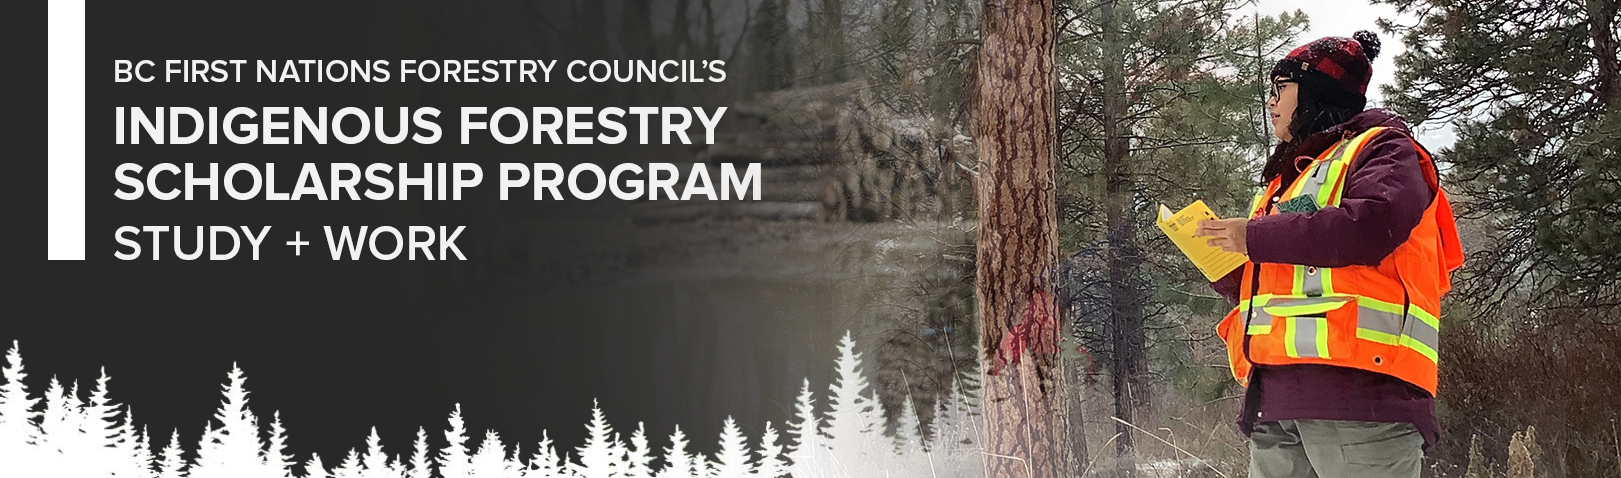 Indigenous Forestry Scholarship Program – Scholarship Training Opportunity